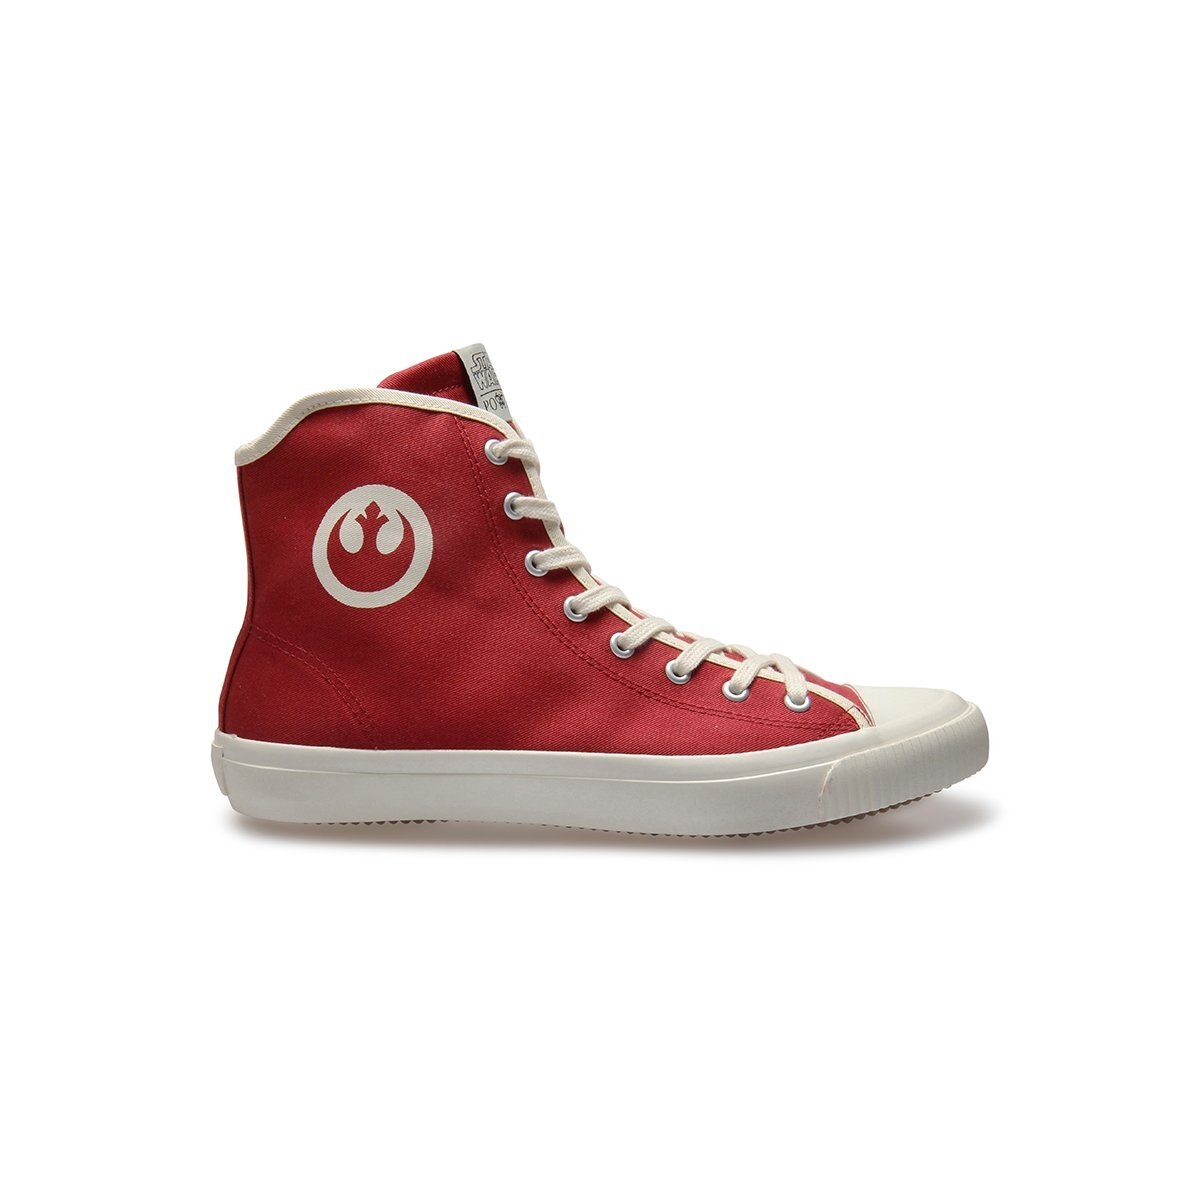 Rebel_Red_Side_clean_sq_shopify.jpg